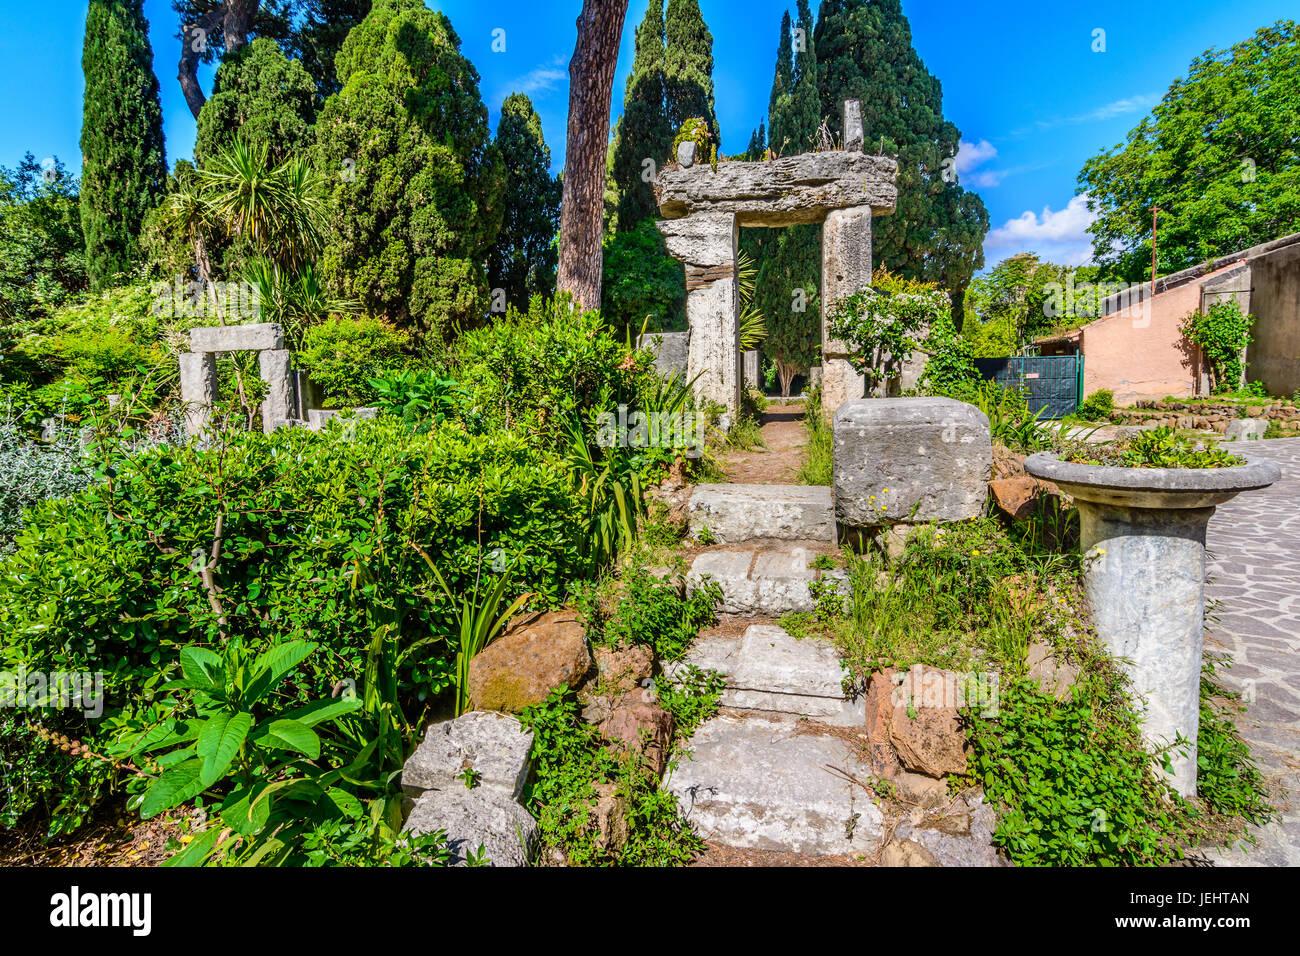 Ancient roman ruin at Villa Celimontana, Rome, Italy - Stock Image